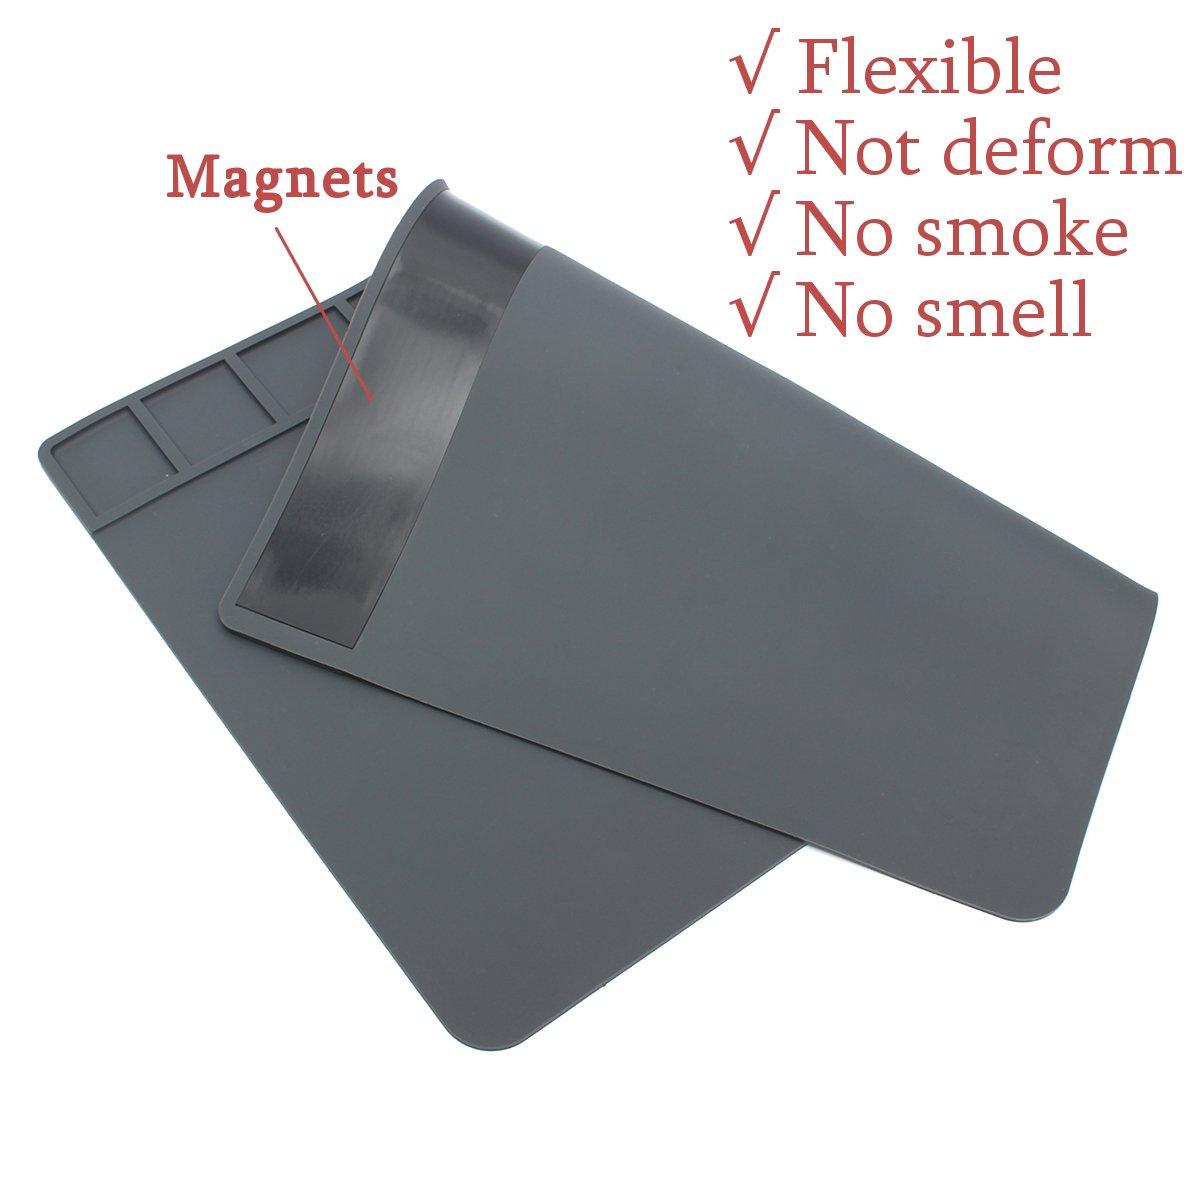 49 x 35cm Big Size Magnets Heat Insulation Silicone Soldering Repair Station Platform